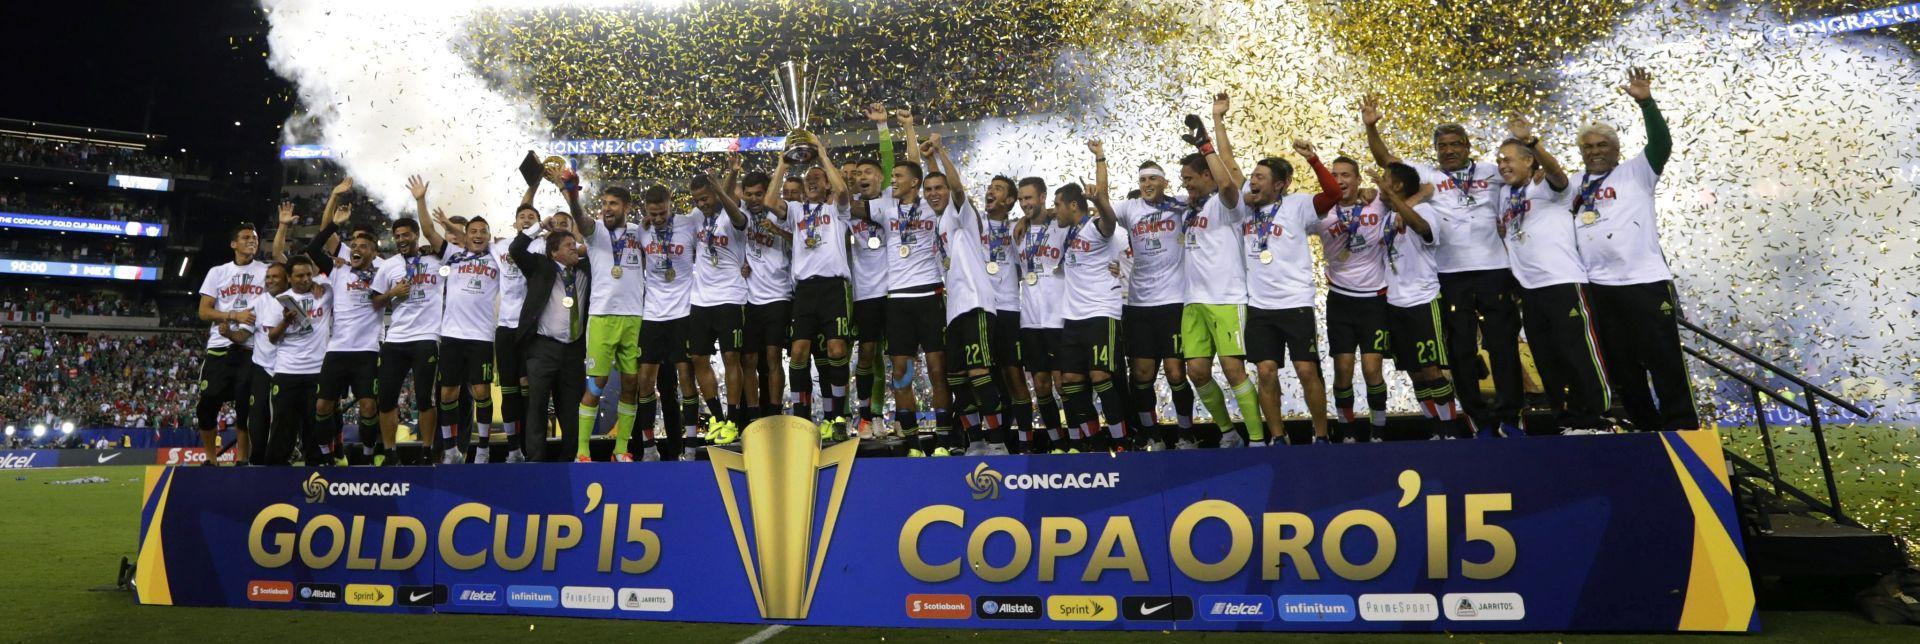 Meksiko osvojio Gold Cup